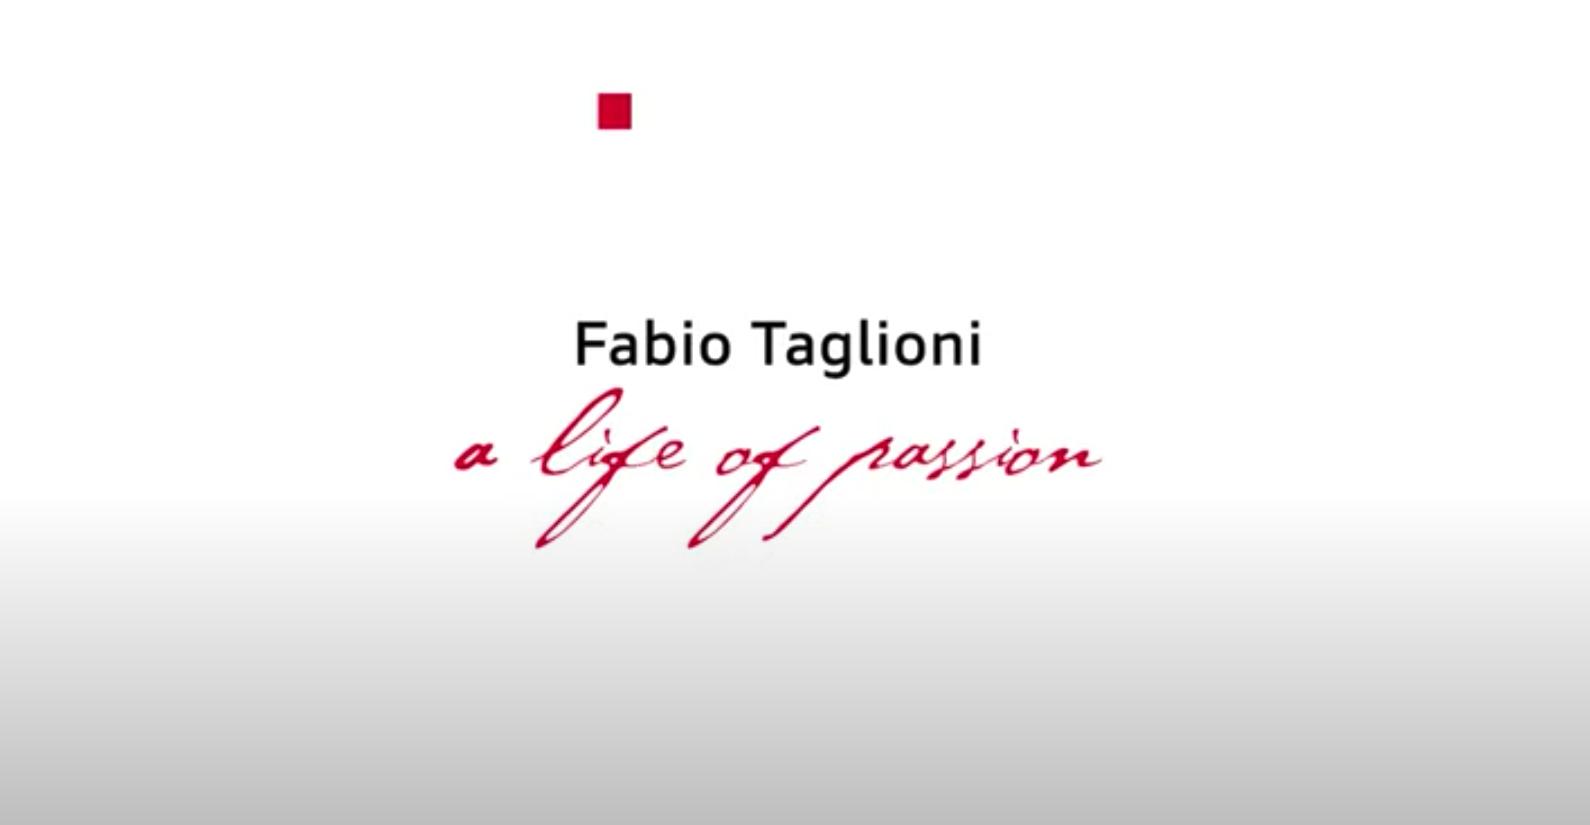 fabio taglioni documentary series